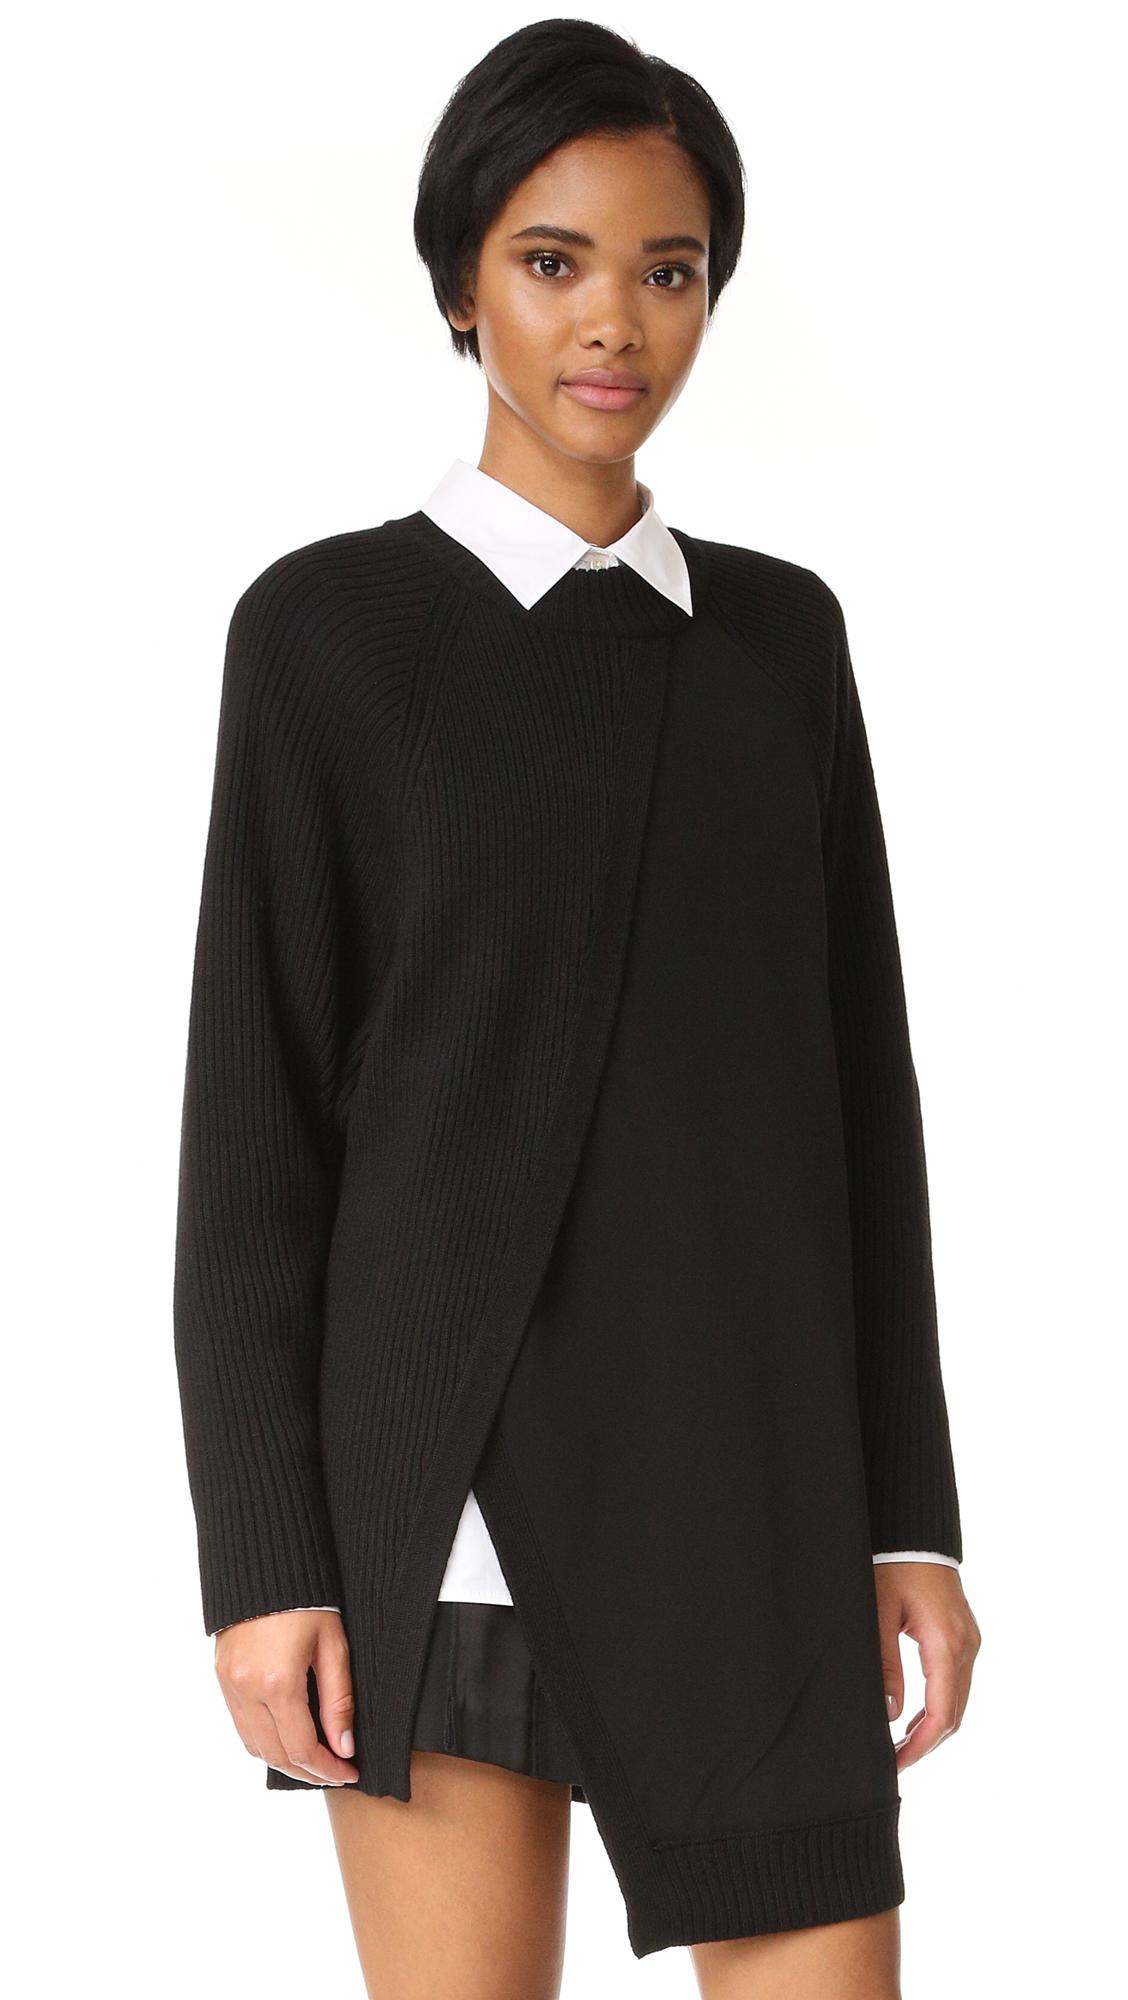 Dkny Crew Neck Rib Tunic With Combo Panel - Black at Shopbop